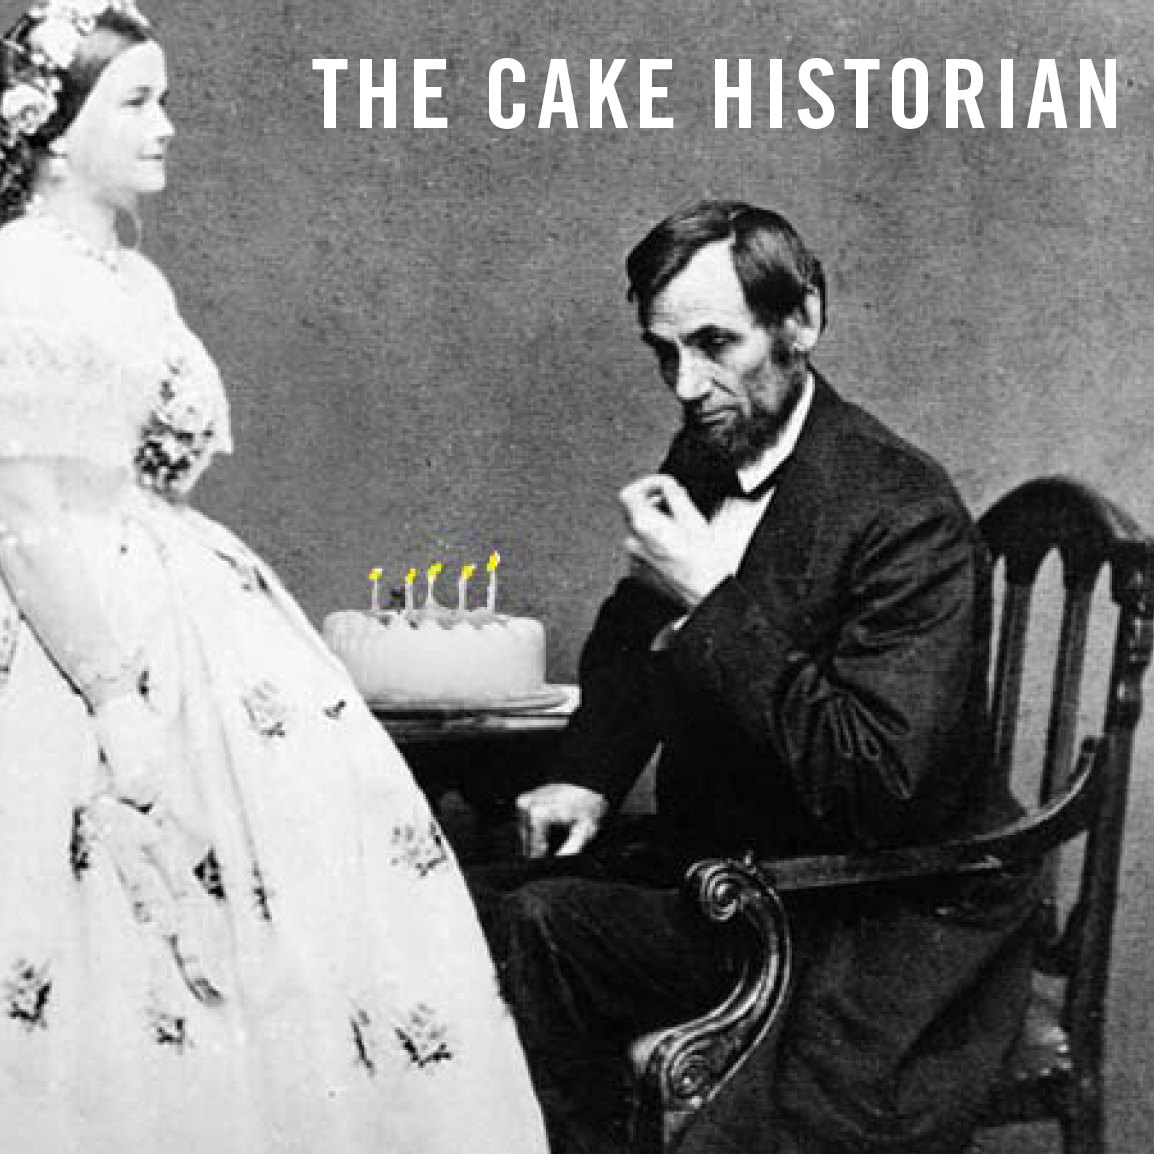 CakeHistorianImage.jpg